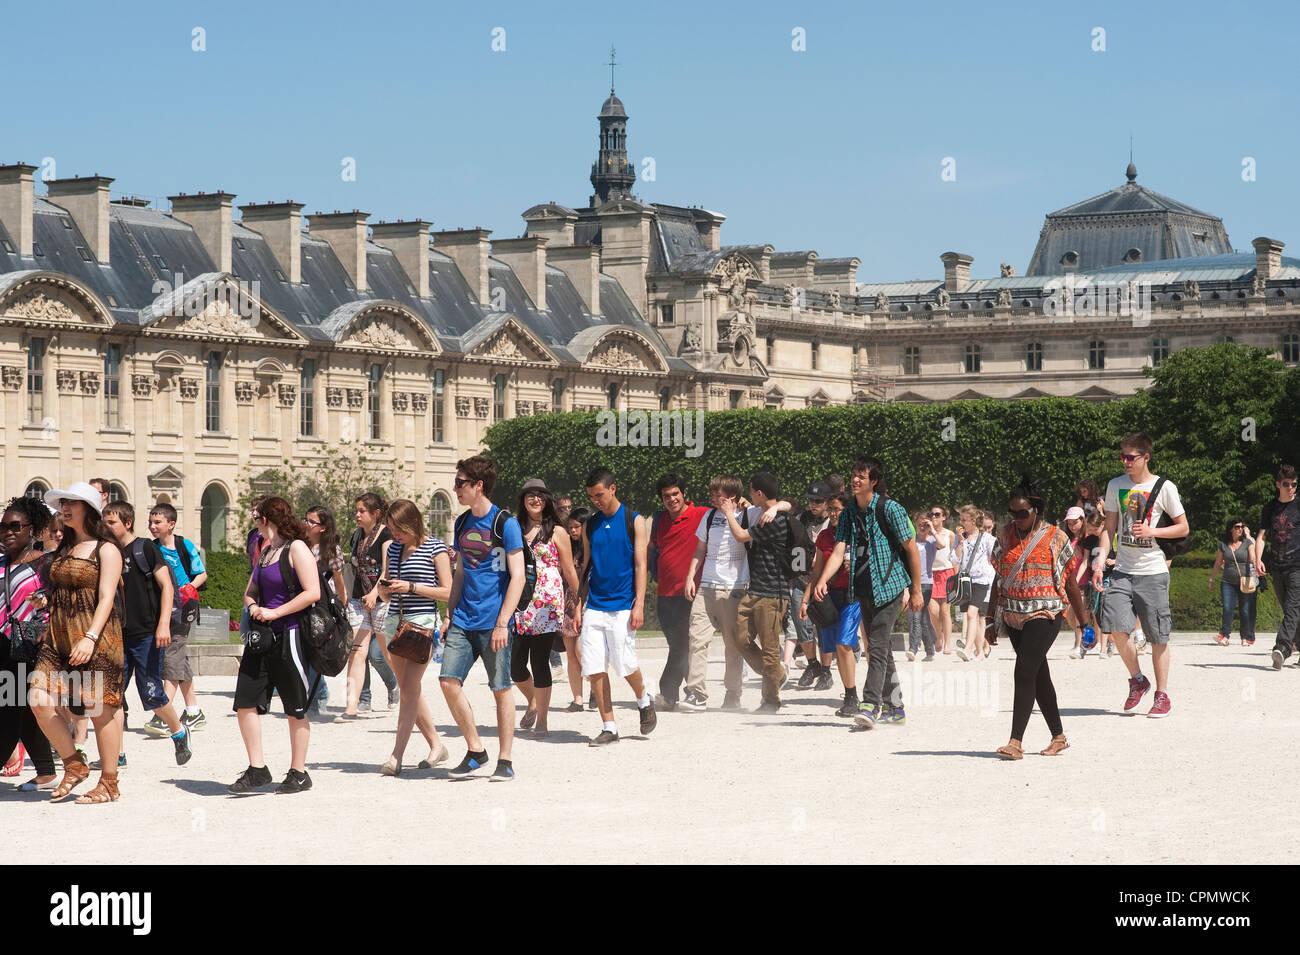 Paris, France -  Schoolchildren during school trip in the Louvre Museum area. - Stock Image